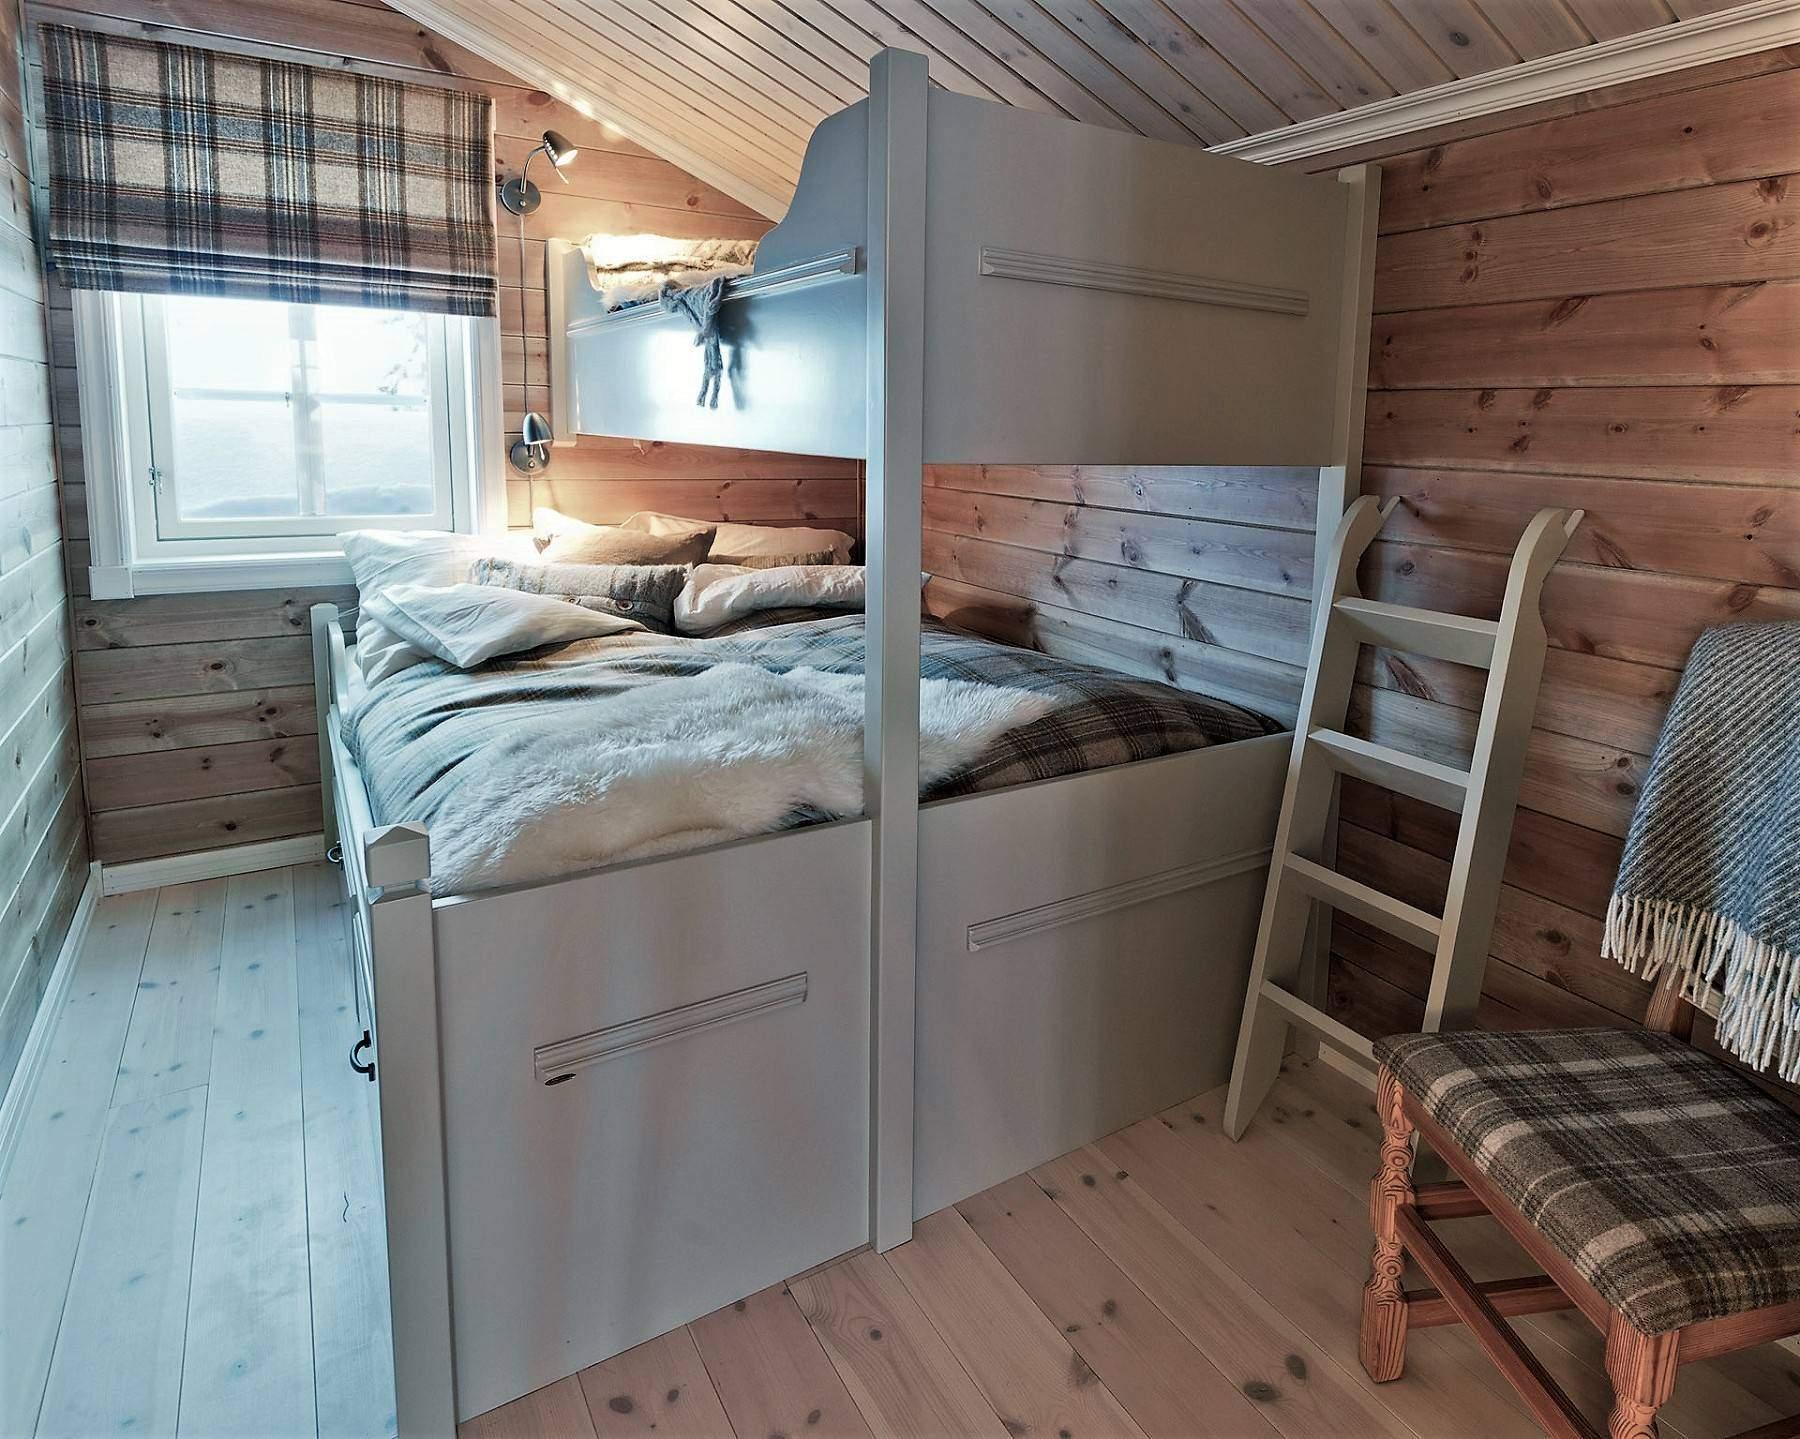 154 Hyttemodell Skeikampen 141. Soverom 4 på loftet.